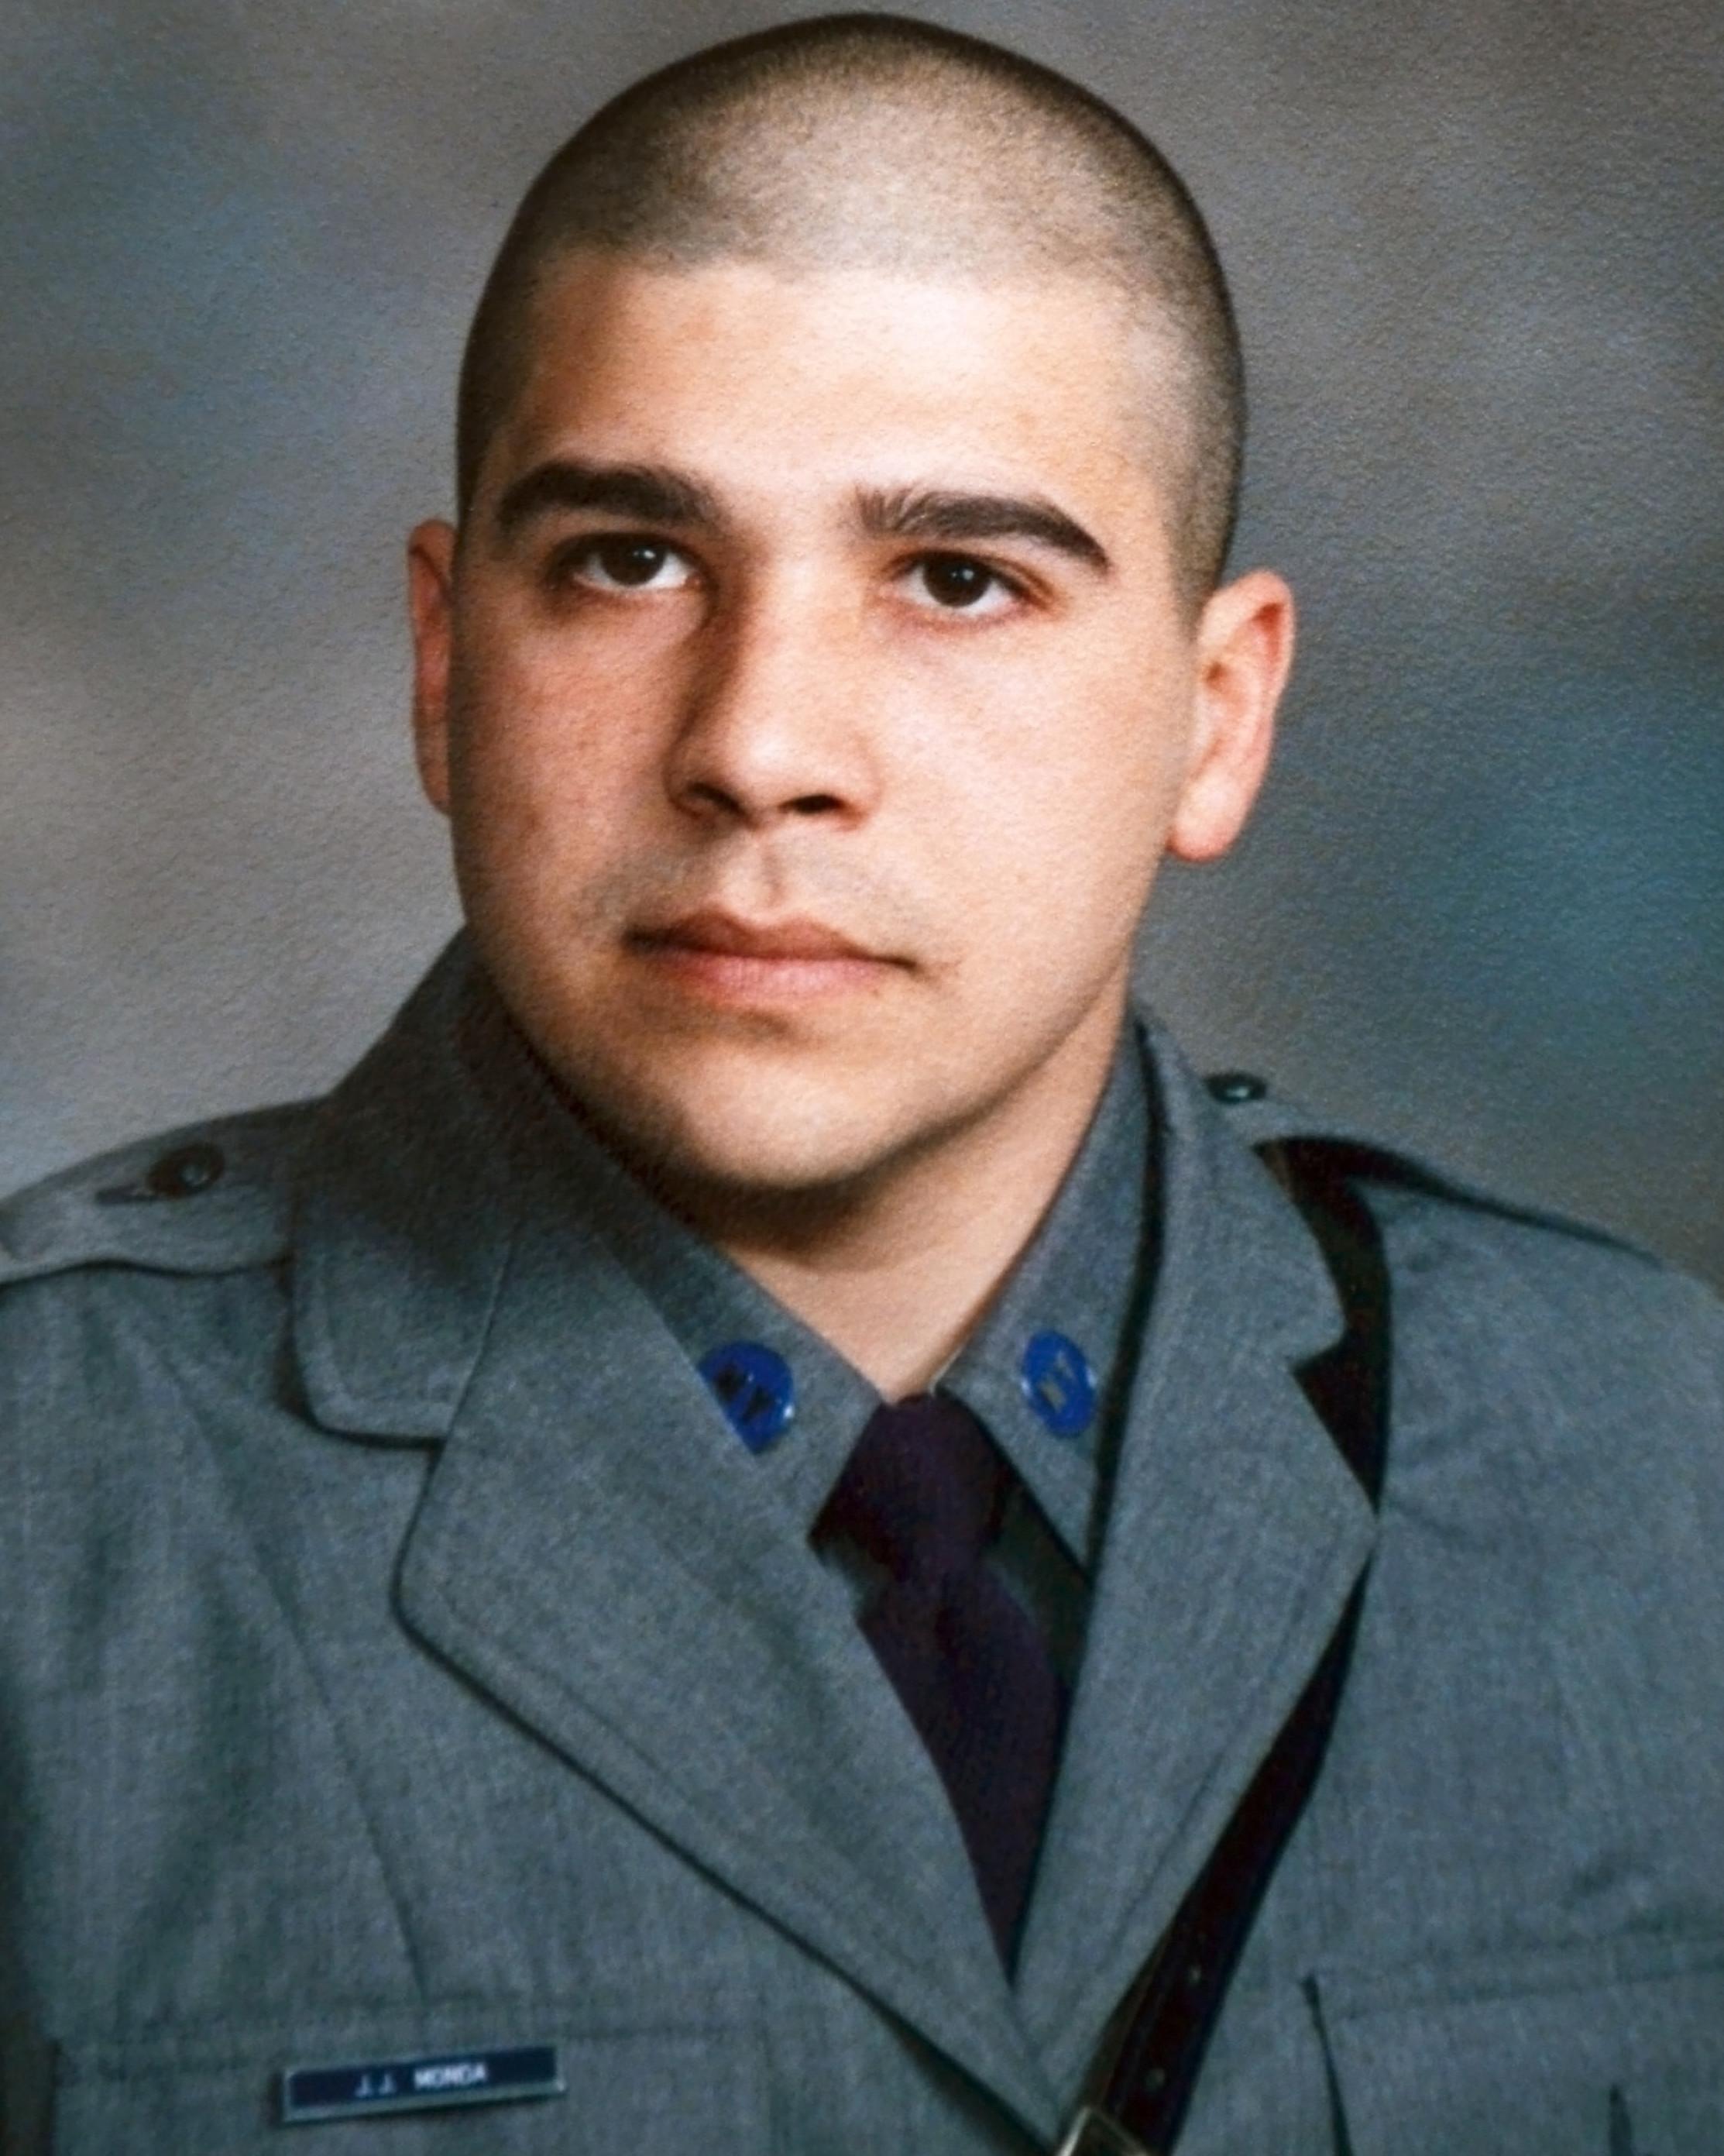 Trooper James J. Monda   New York State Police, New York